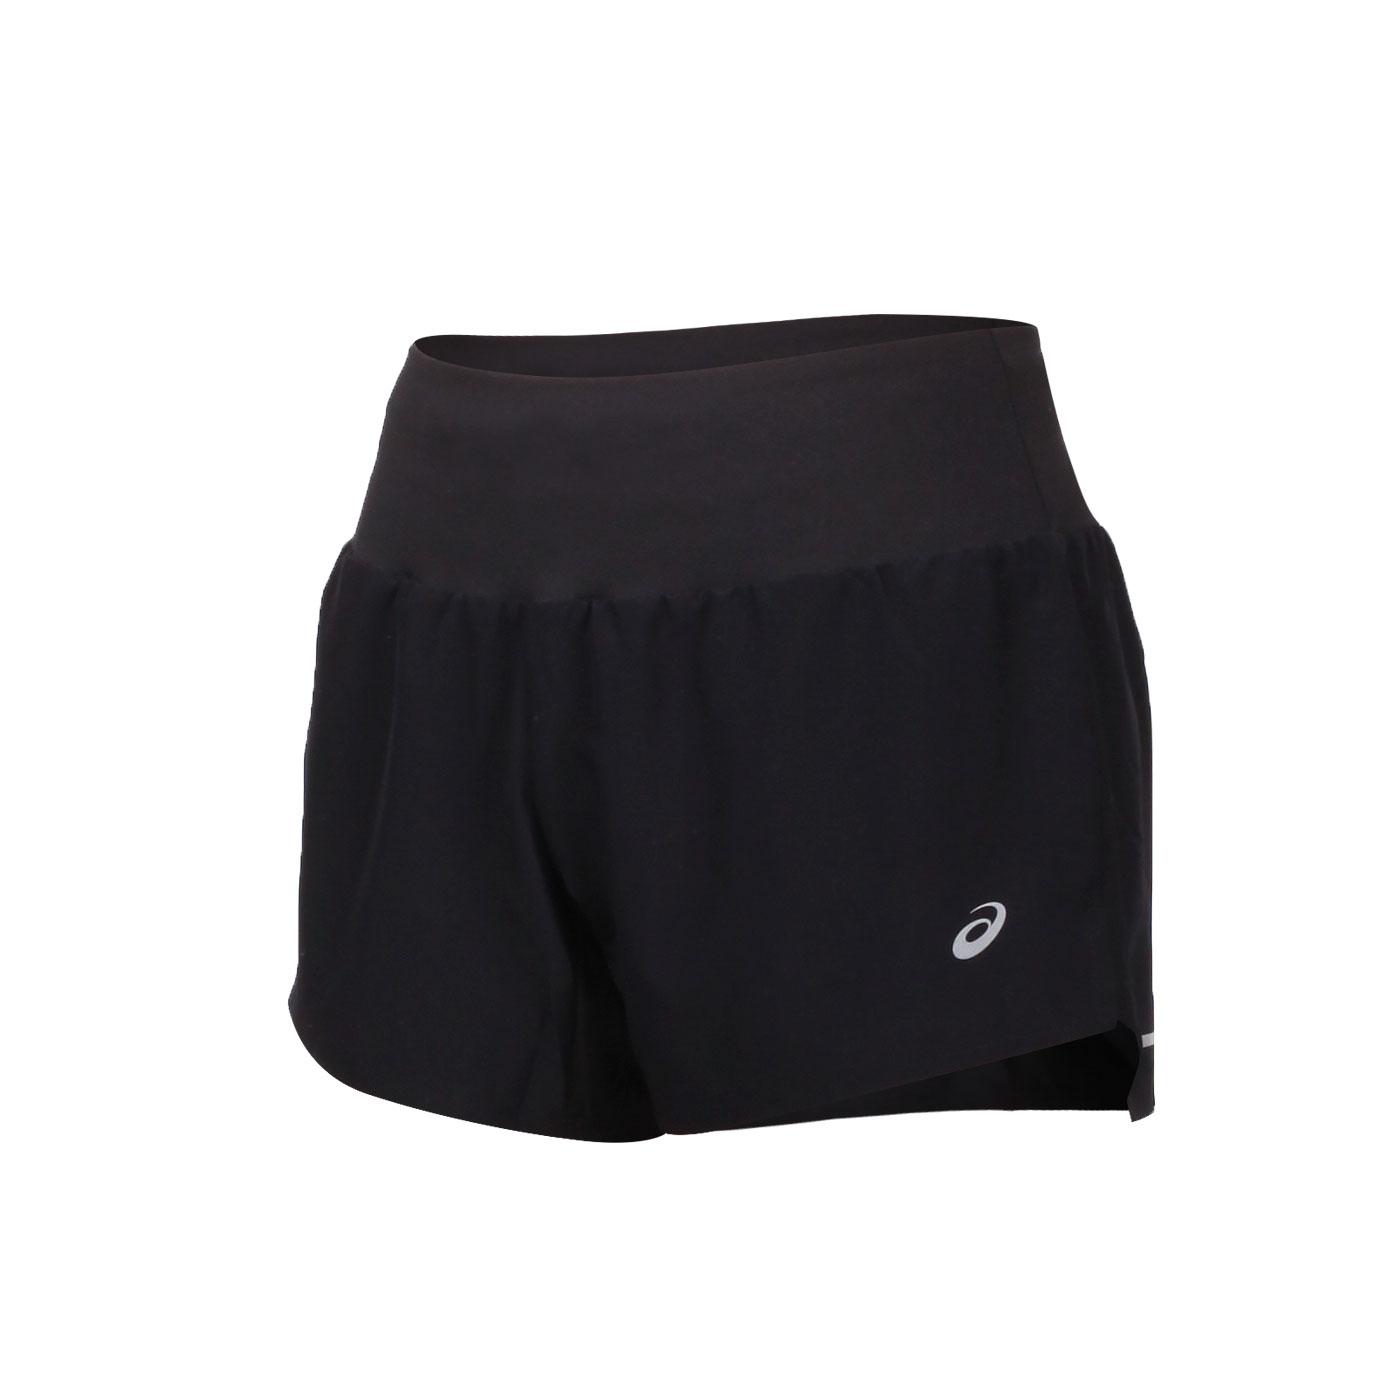 ASICS 女款3.5吋平織短褲 2012A835-001 - 黑銀